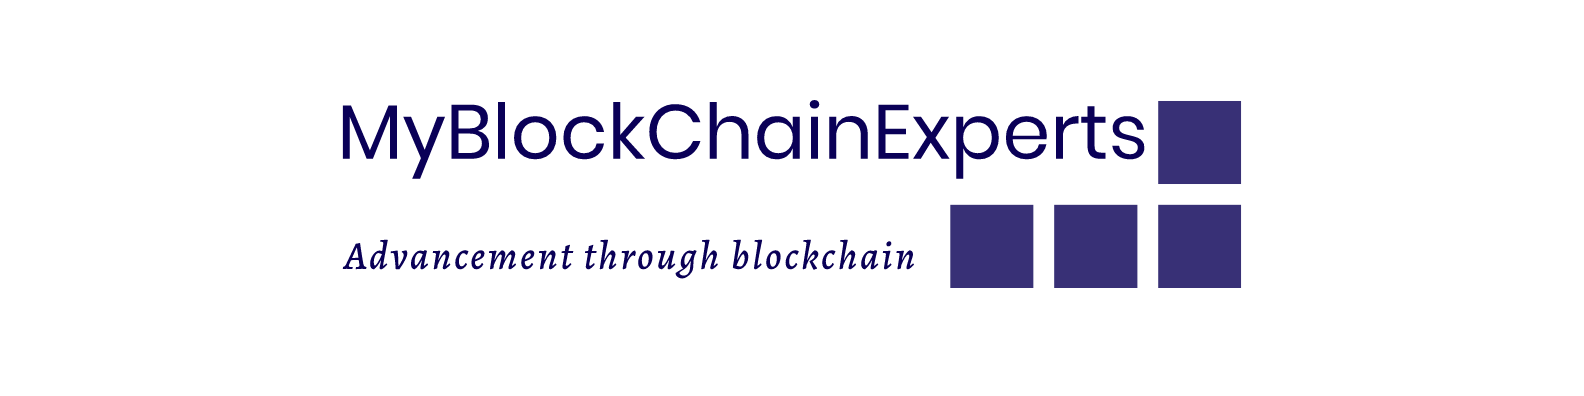 myblockchainexperts